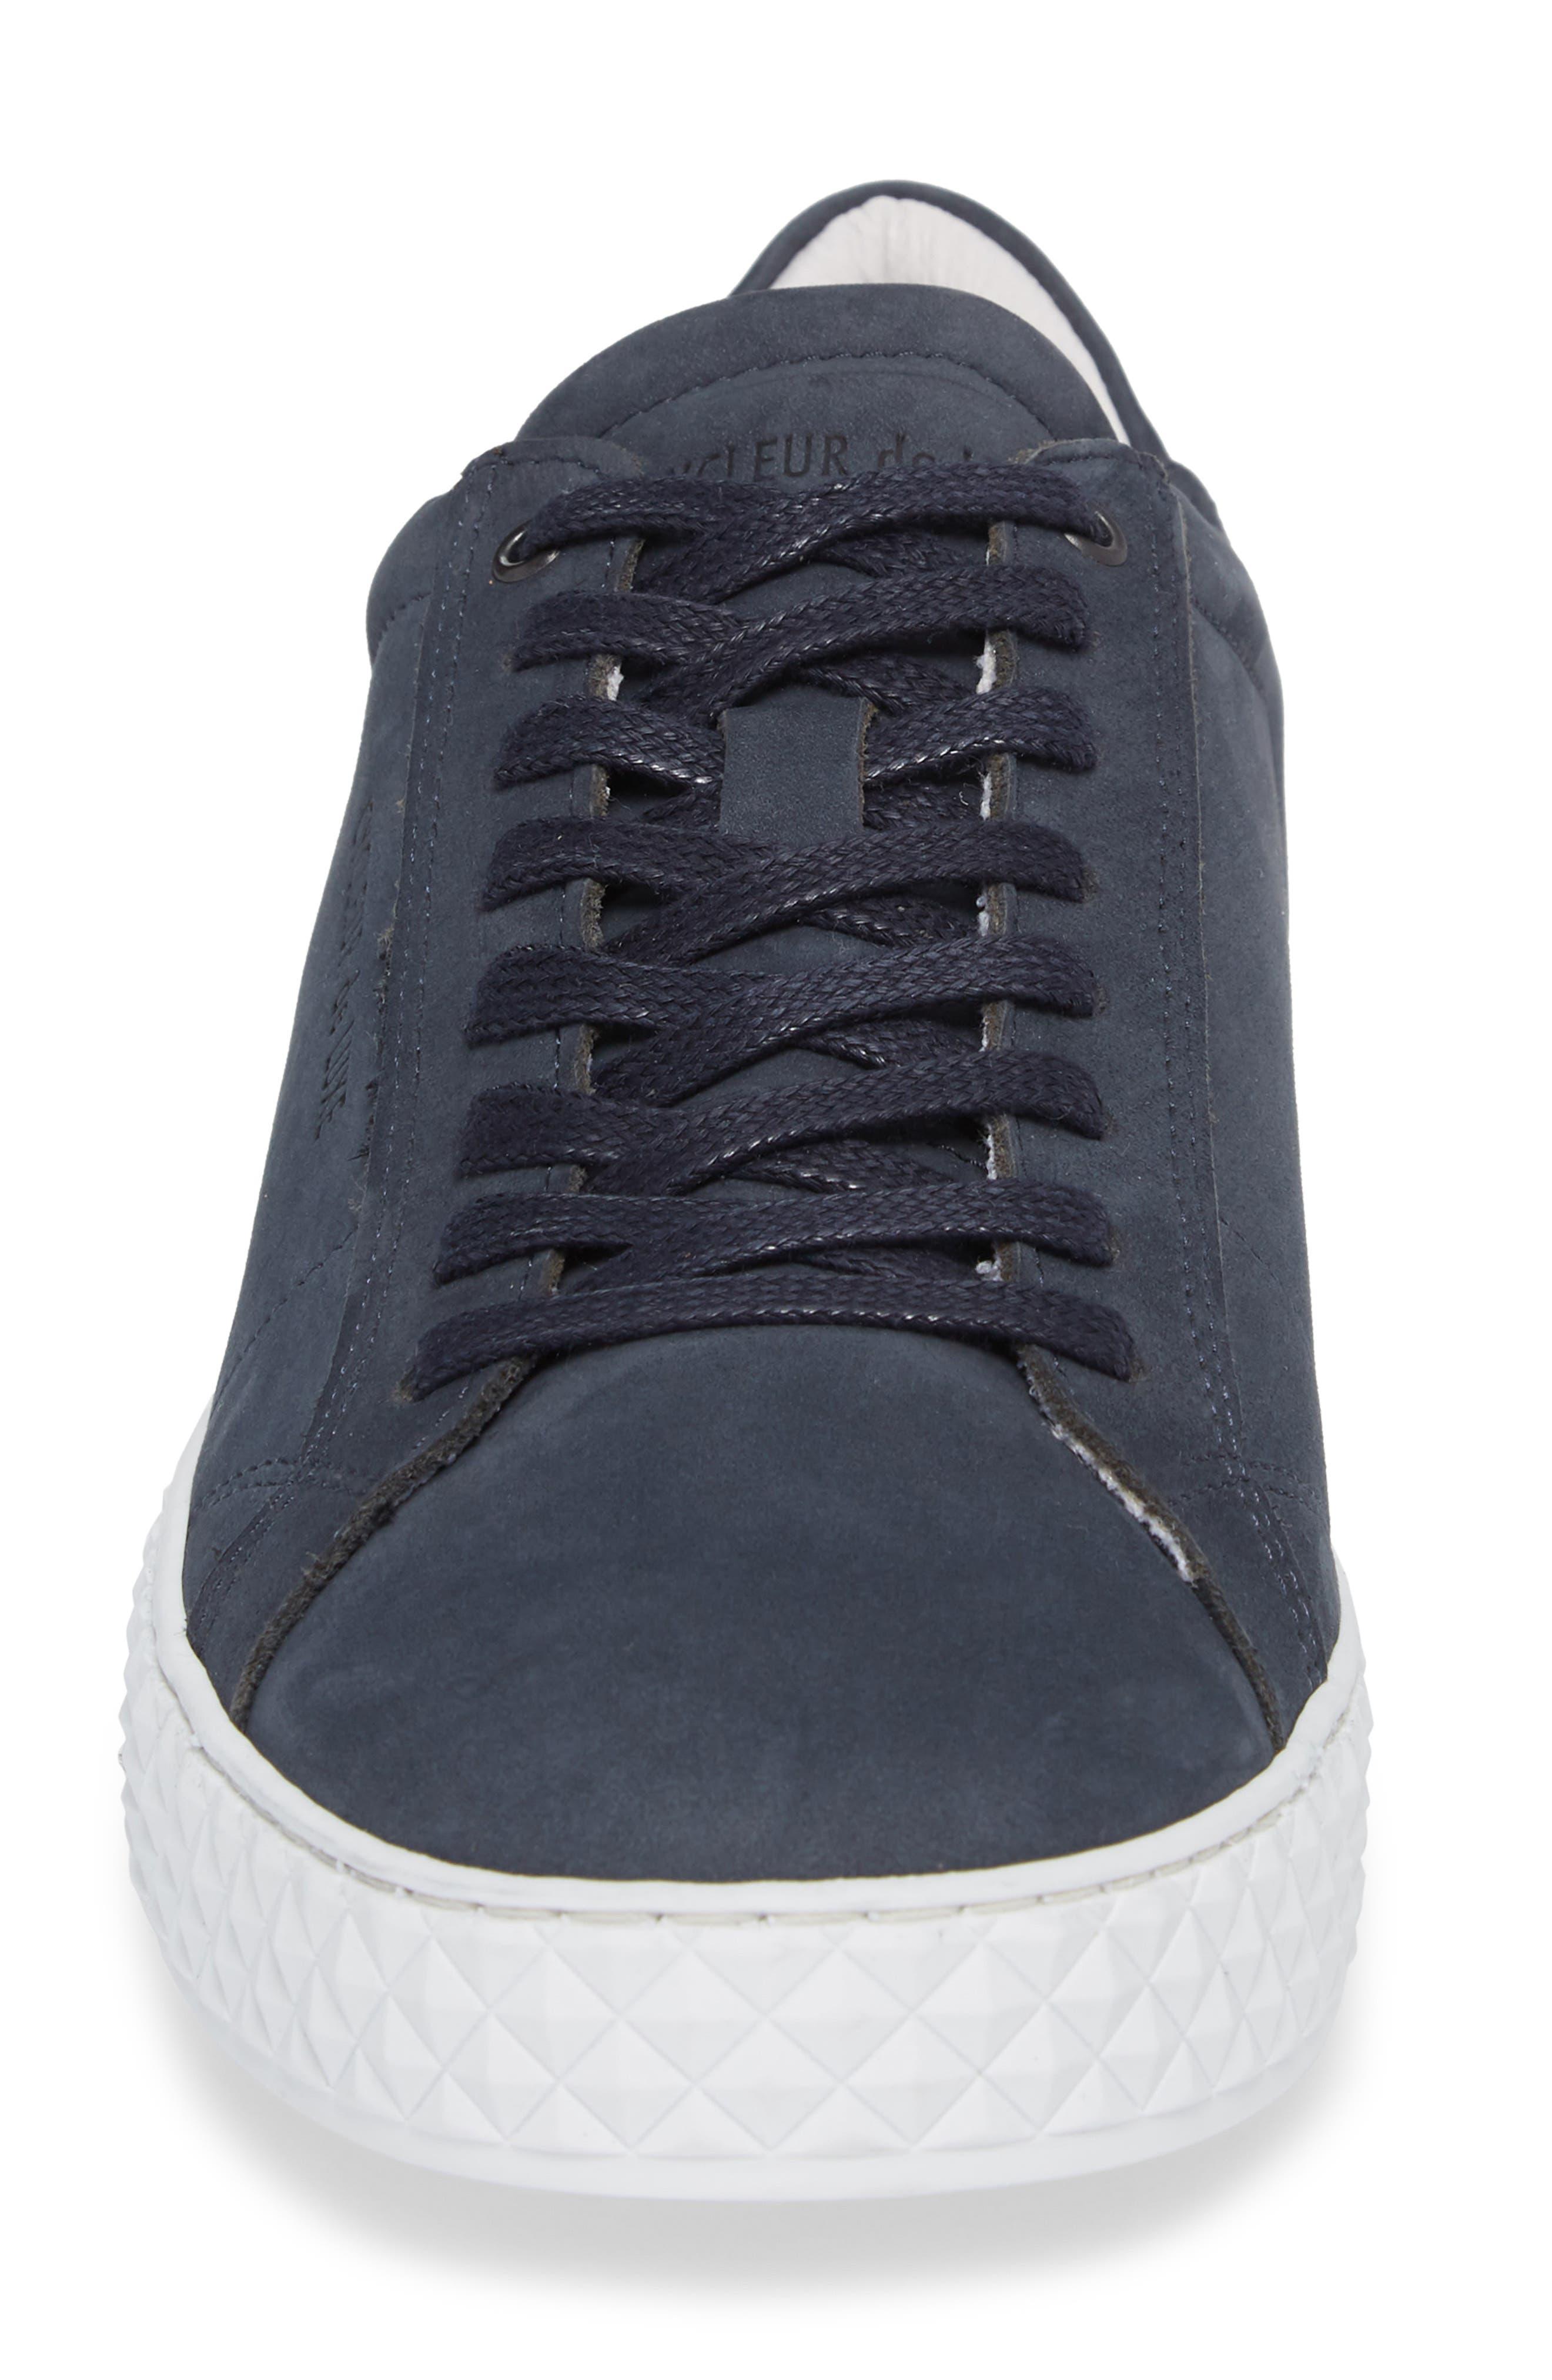 Bratislava Low Top Sneaker,                             Alternate thumbnail 4, color,                             Navy Leather